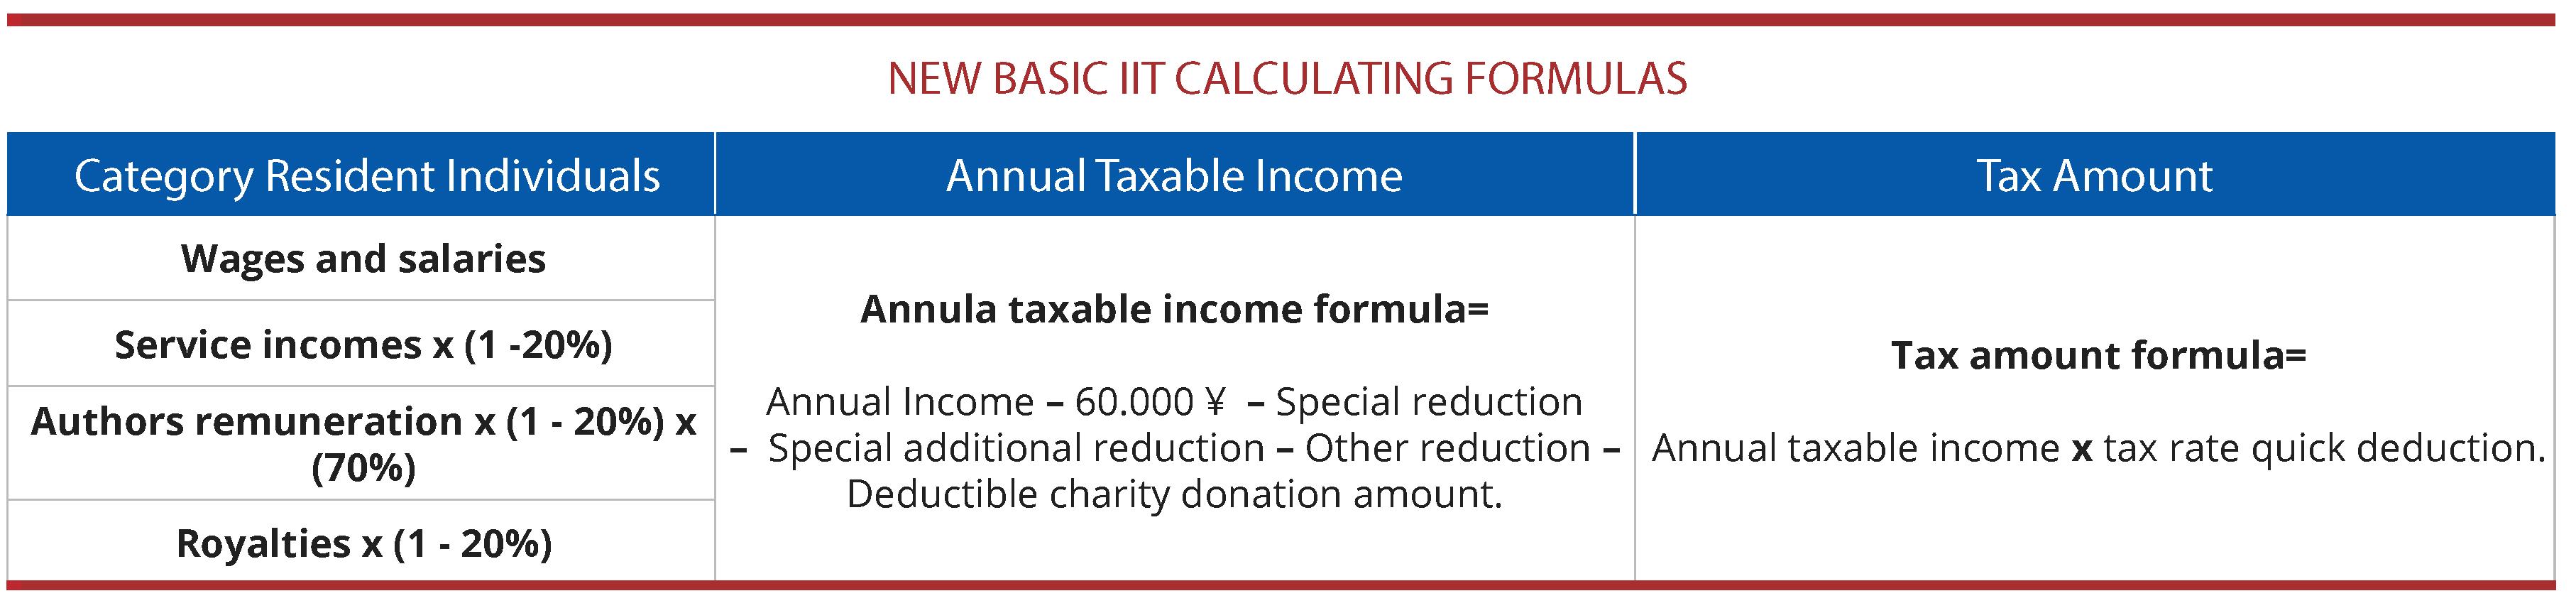 China Individual Income Tax 2019